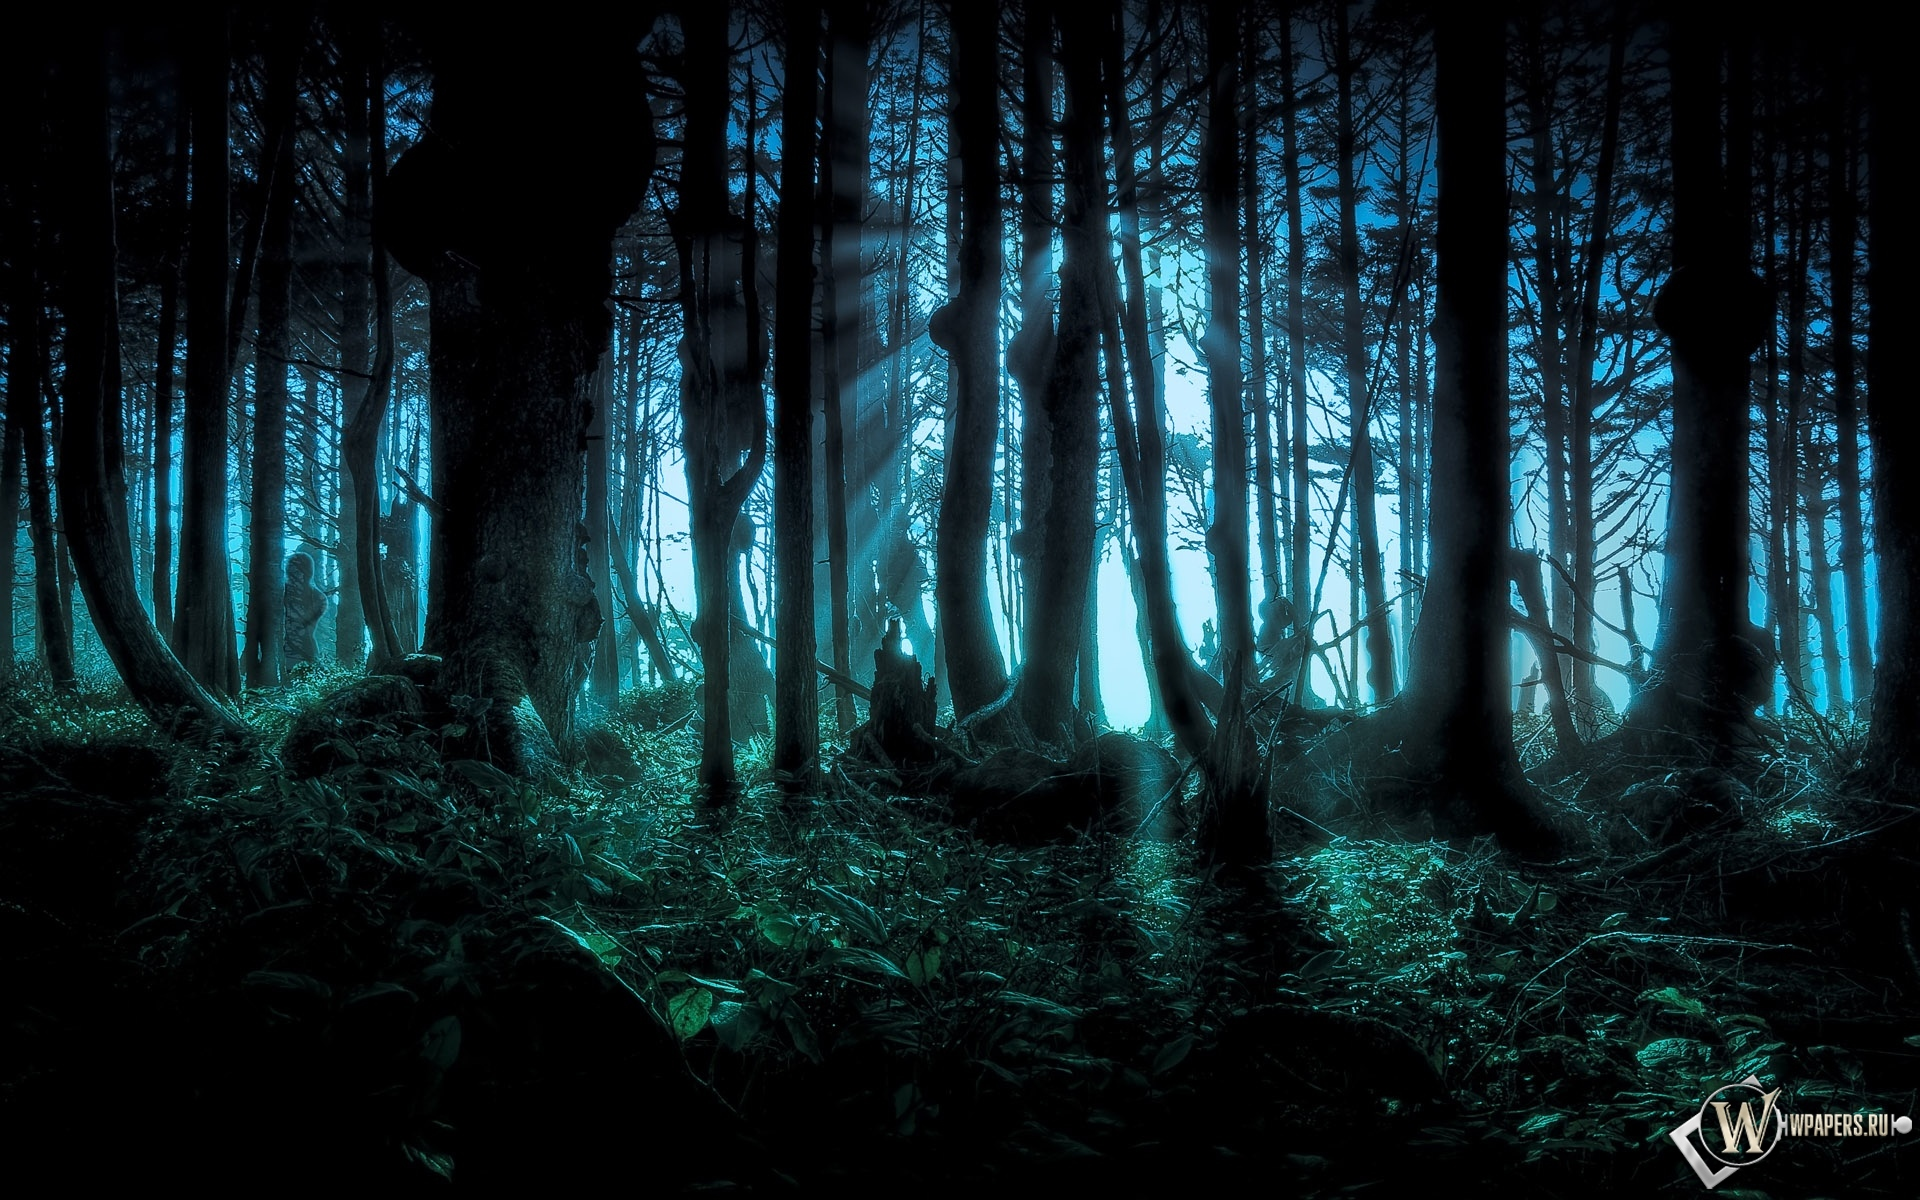 Обои лес лес деревья мрак 1920x1200